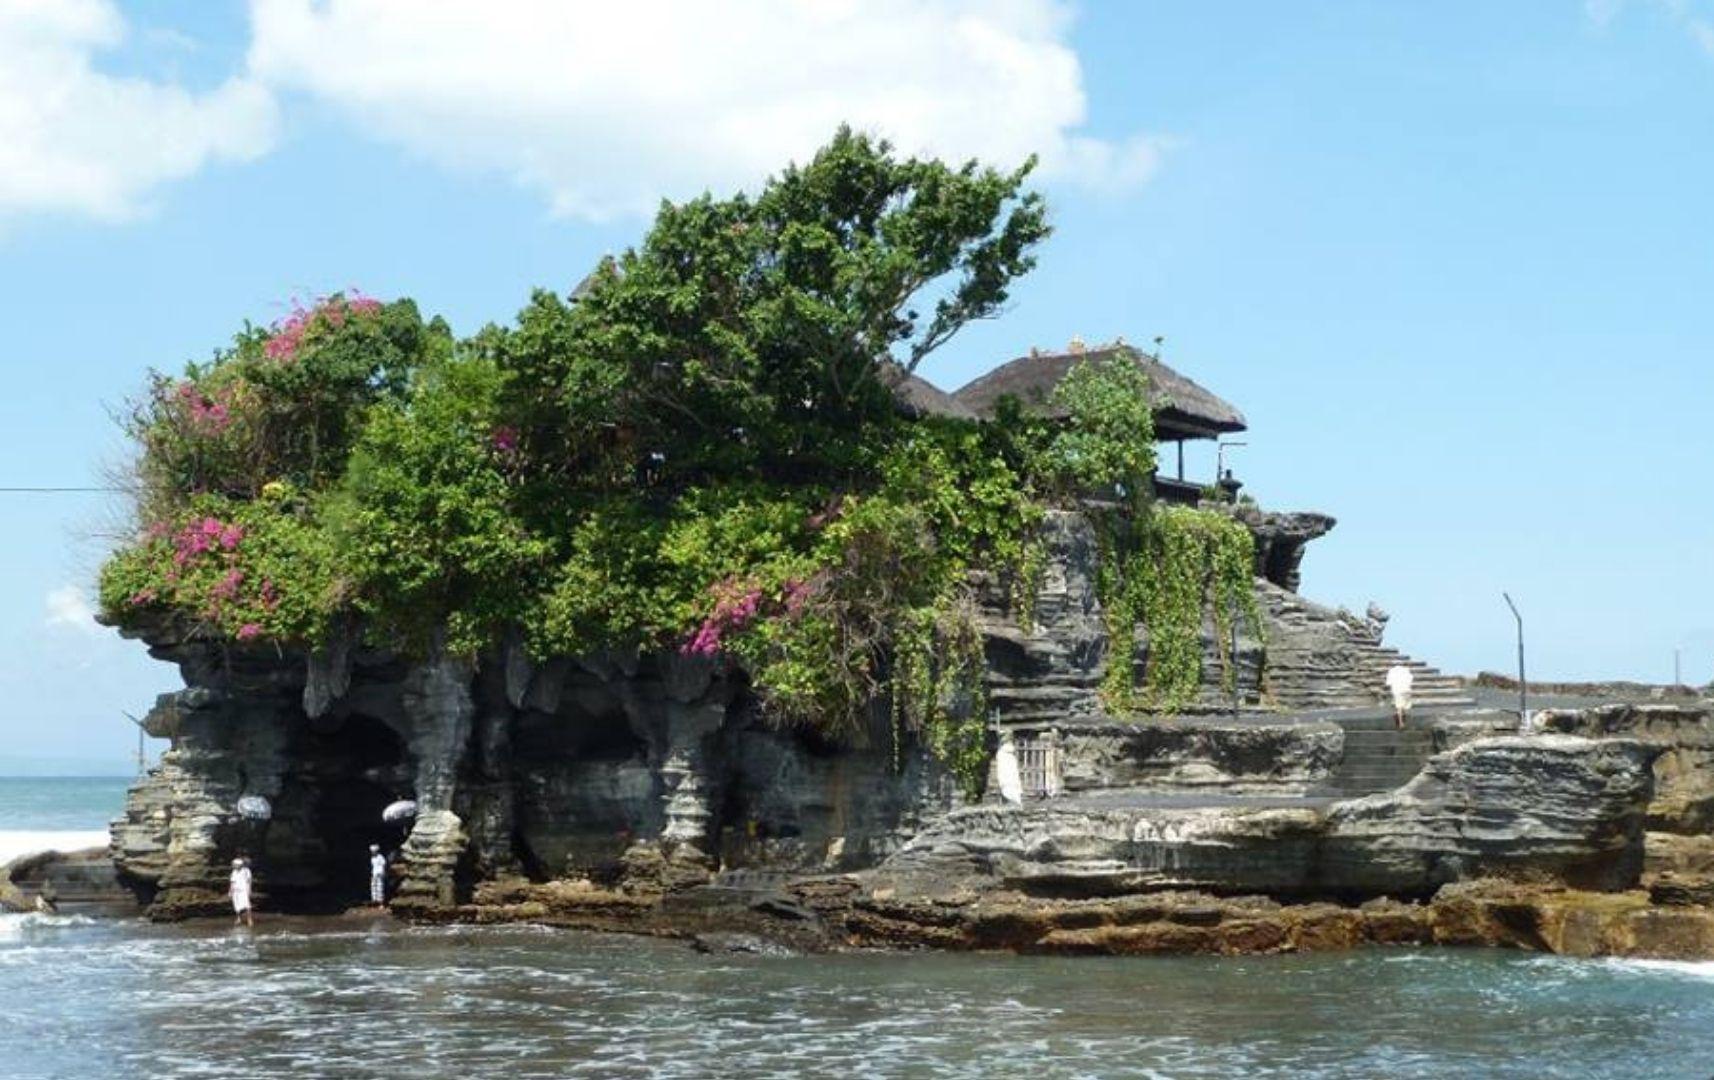 Bali Reiseart Reisebericht